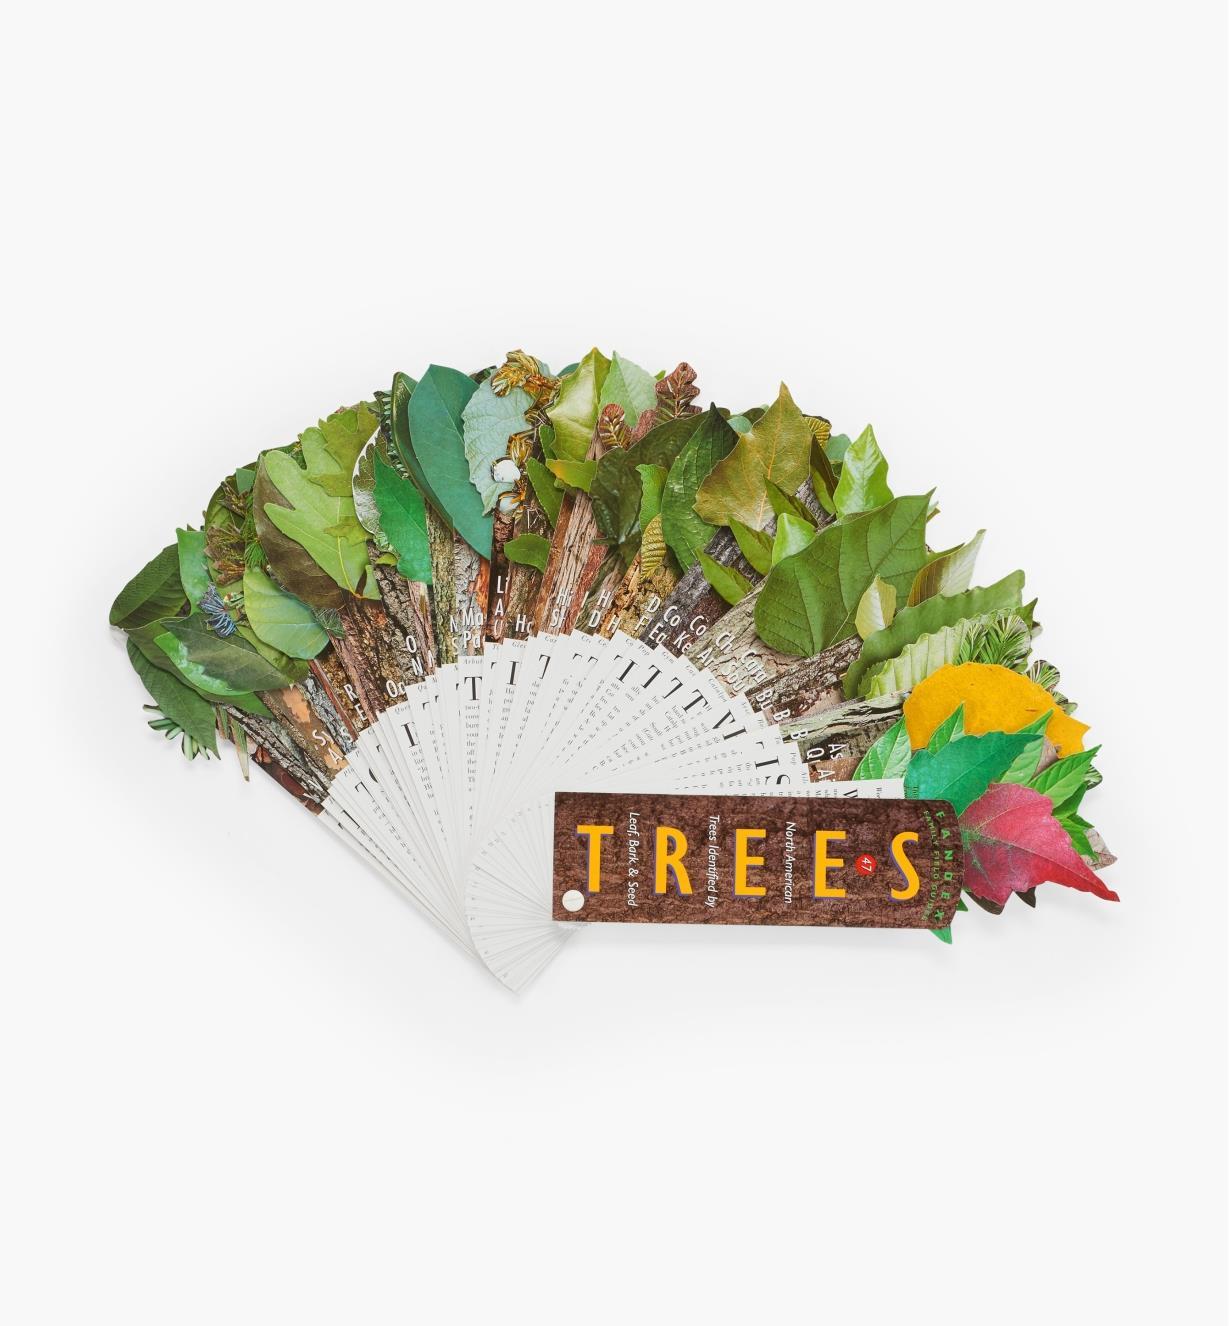 LA216 - Fandex Tree Identification Guide